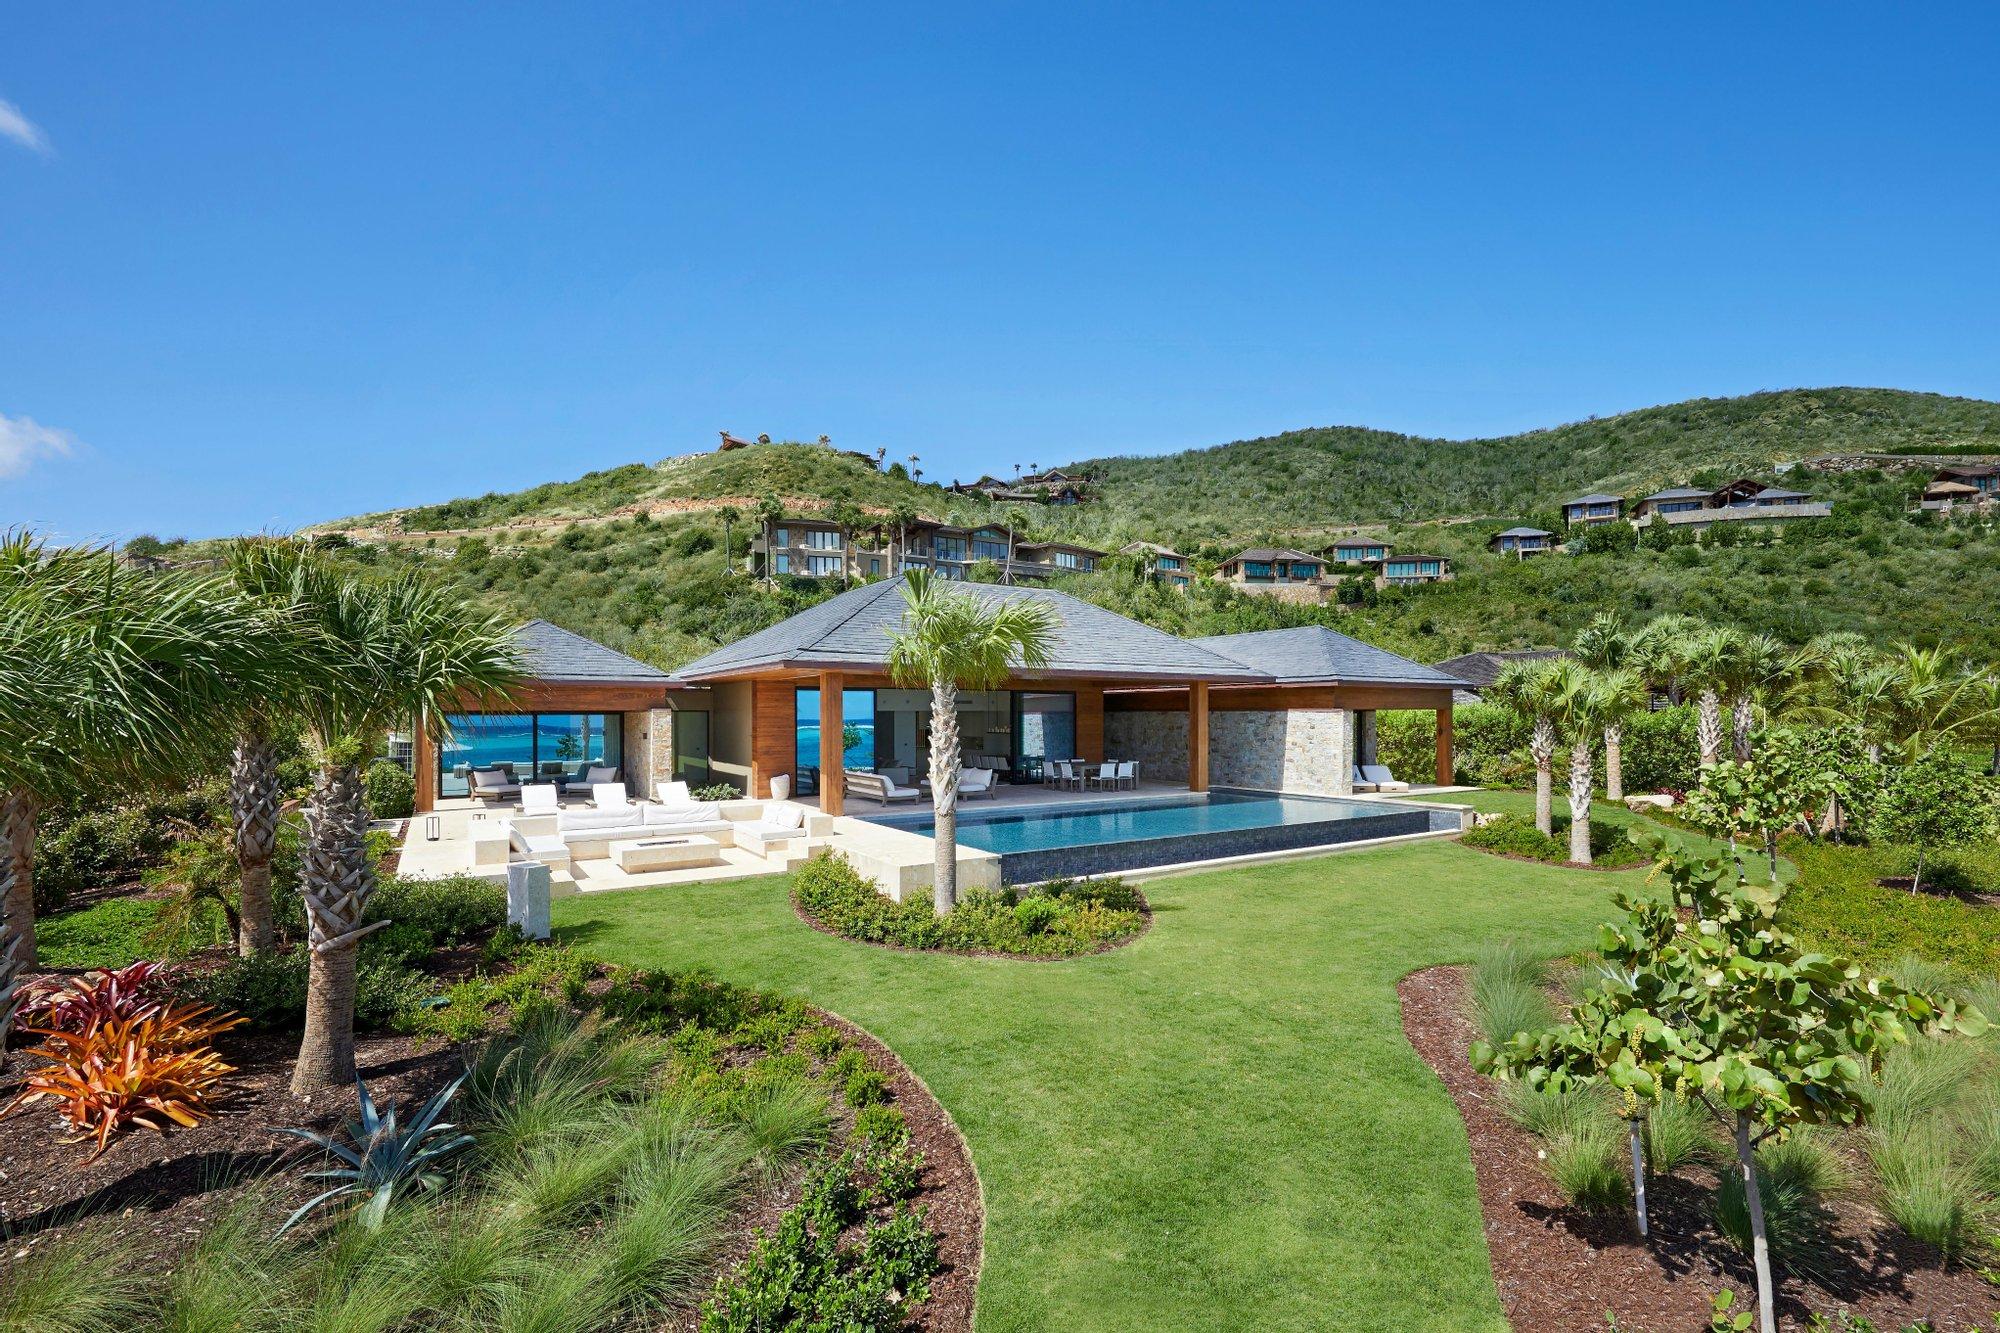 House in Spanish Town, Virgin Gorda, British Virgin Islands 1 - 11389493